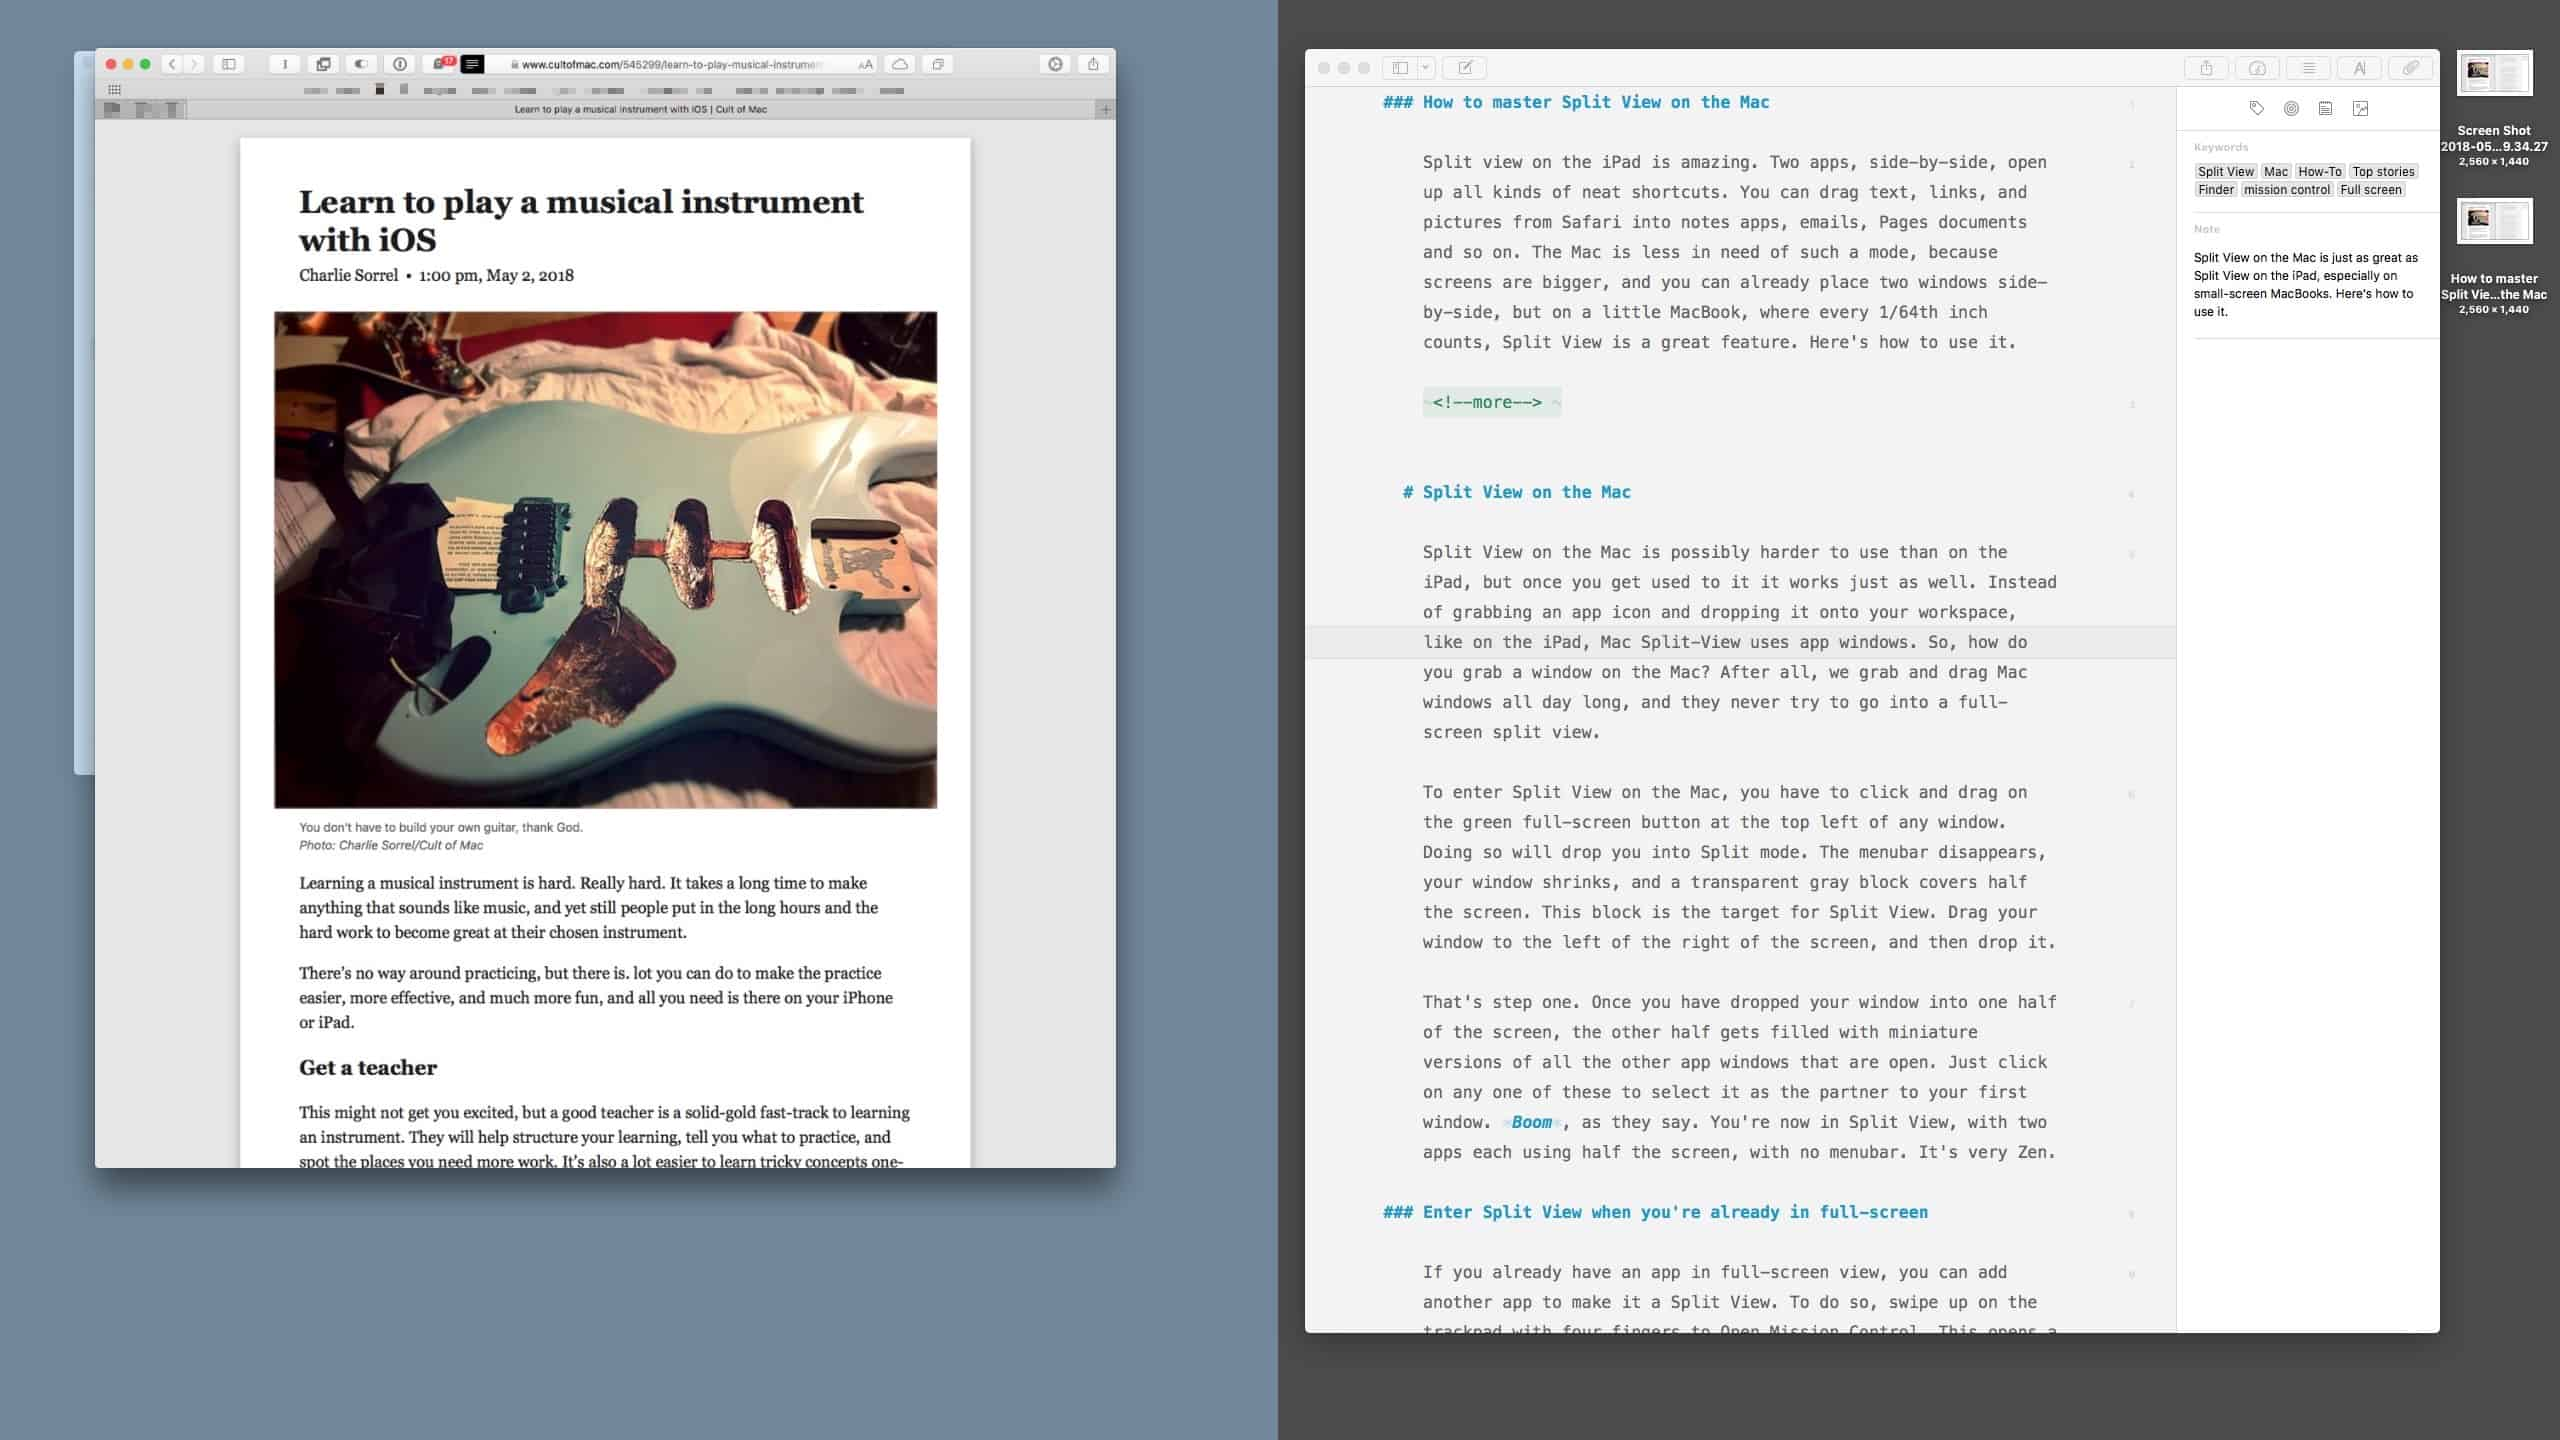 Entering Split View on the Mac.